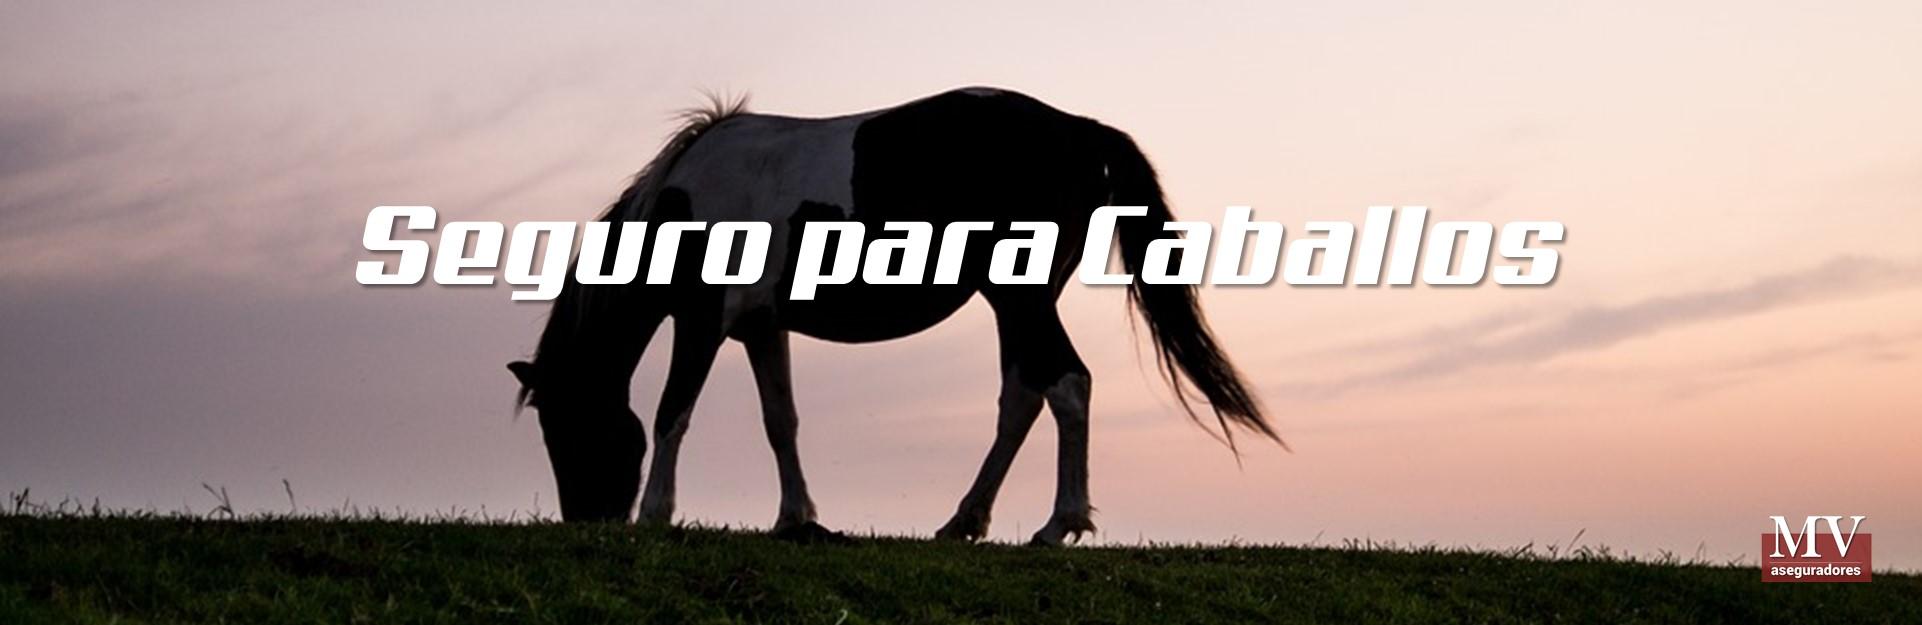 slider 3 seguro de caballos